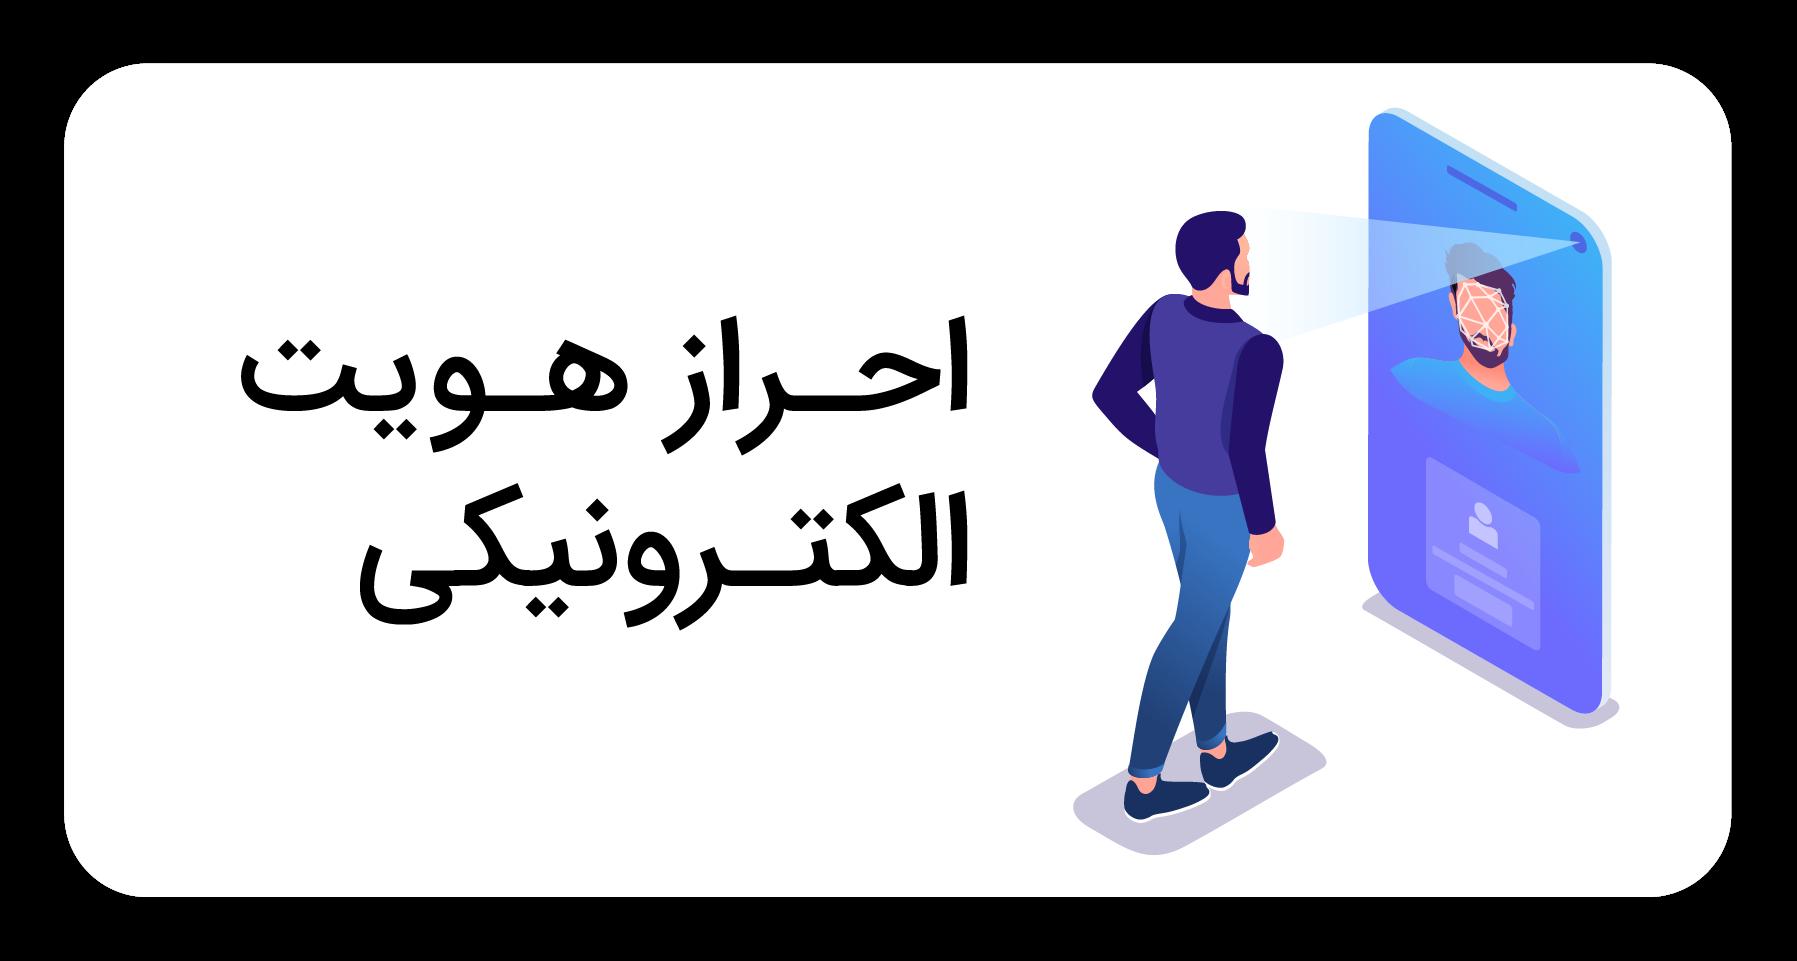 احراز هویت الکترونیکی